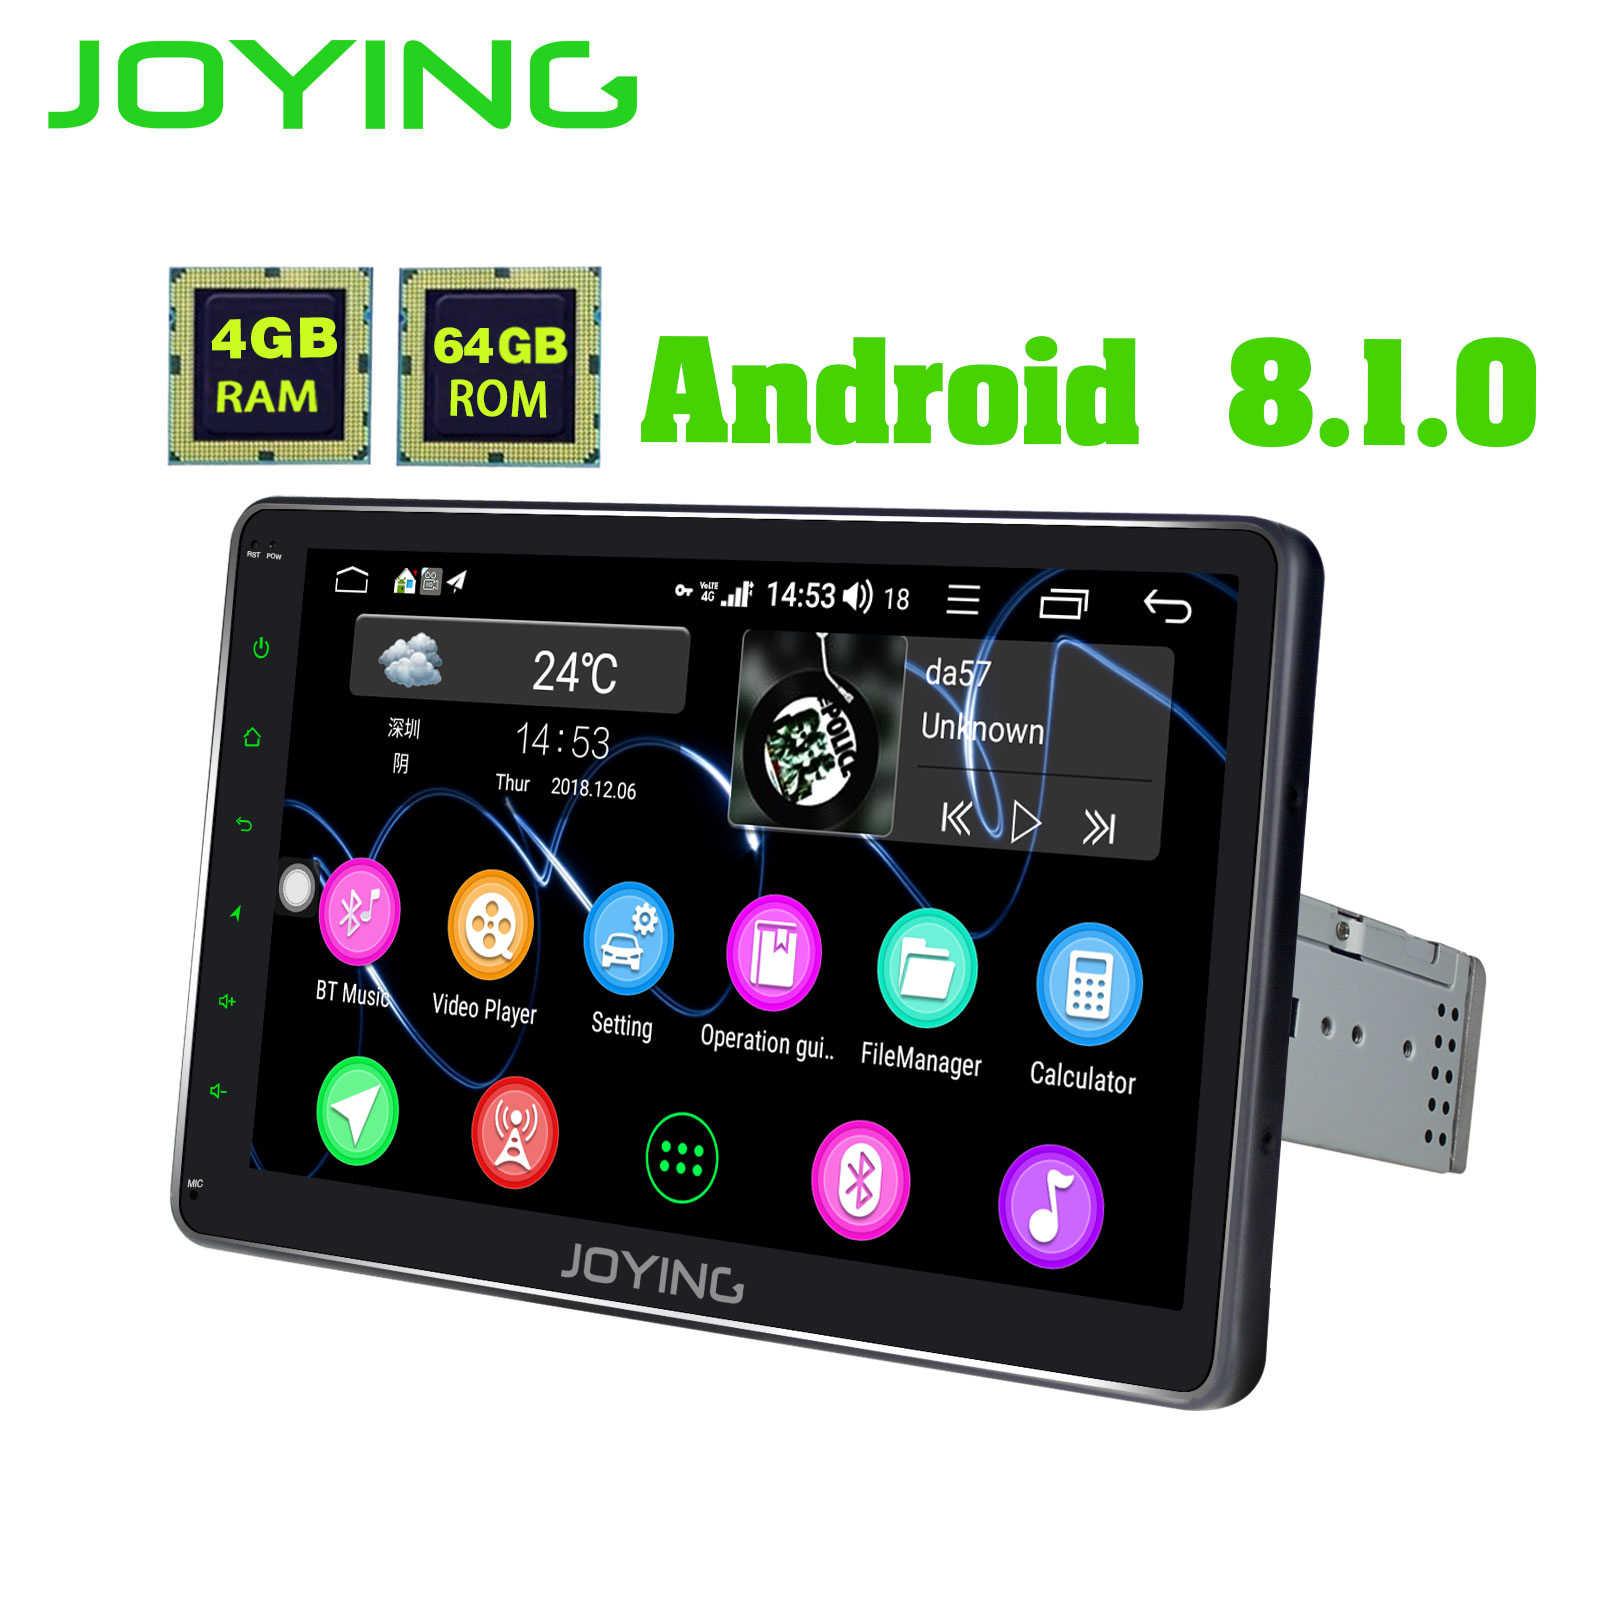 "JOYING 10 ""オクタコアヘッドユニットアンドロイド 8.1 ユニバーサルカーラジオステレオ 1280*720 HD NO DVD プレーヤー内蔵 DSP SPDIF BT Fm のステアリング"